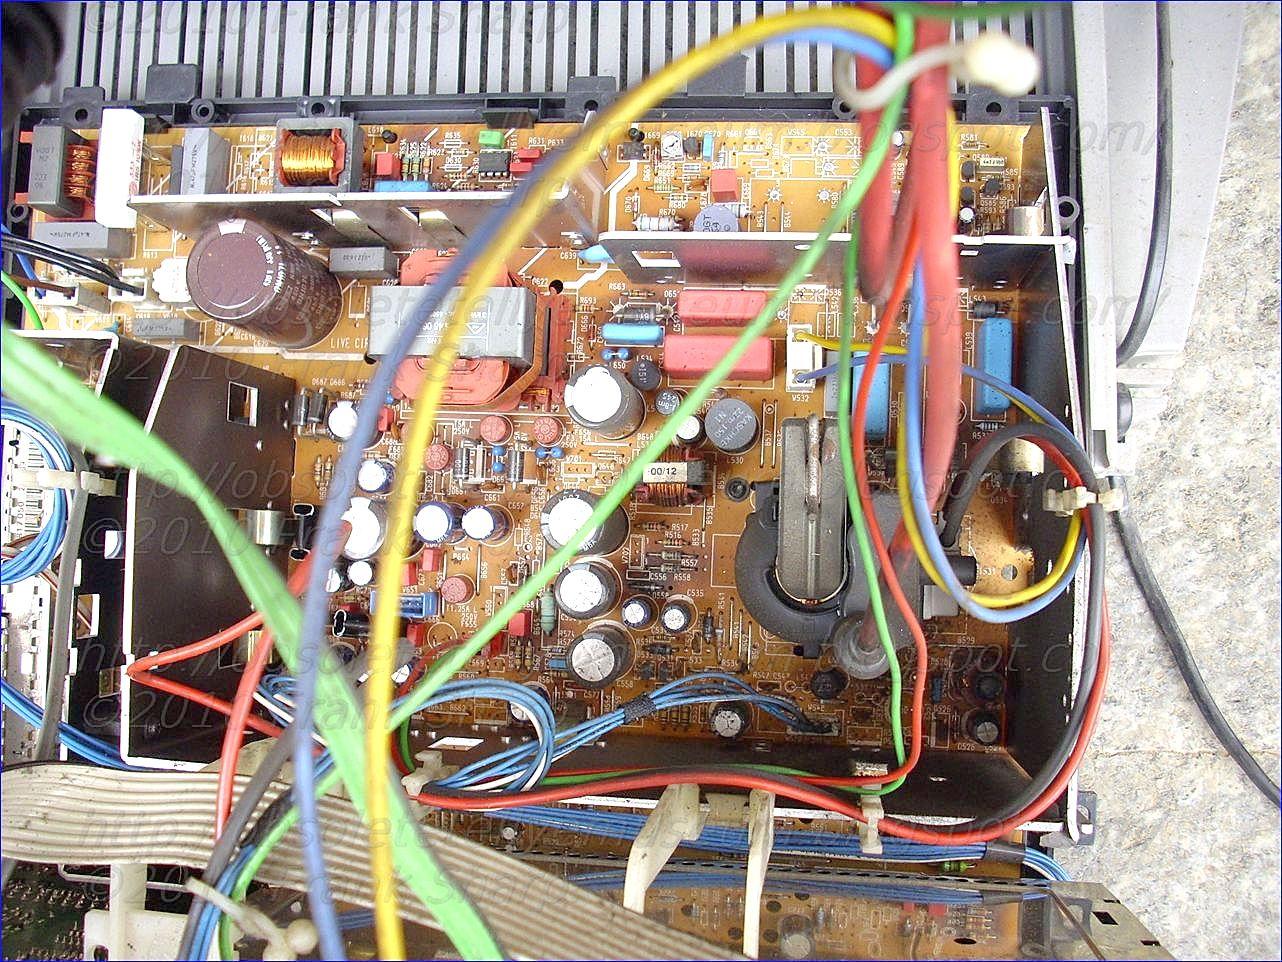 Obsolete Technology Tellye Loewe Cantus 3872zp 59460u72 Chassis 60 Watts Audio Amplifier Circuit Using Tda7296 Class Ab 110q414 V6xx Q4140 Internal View